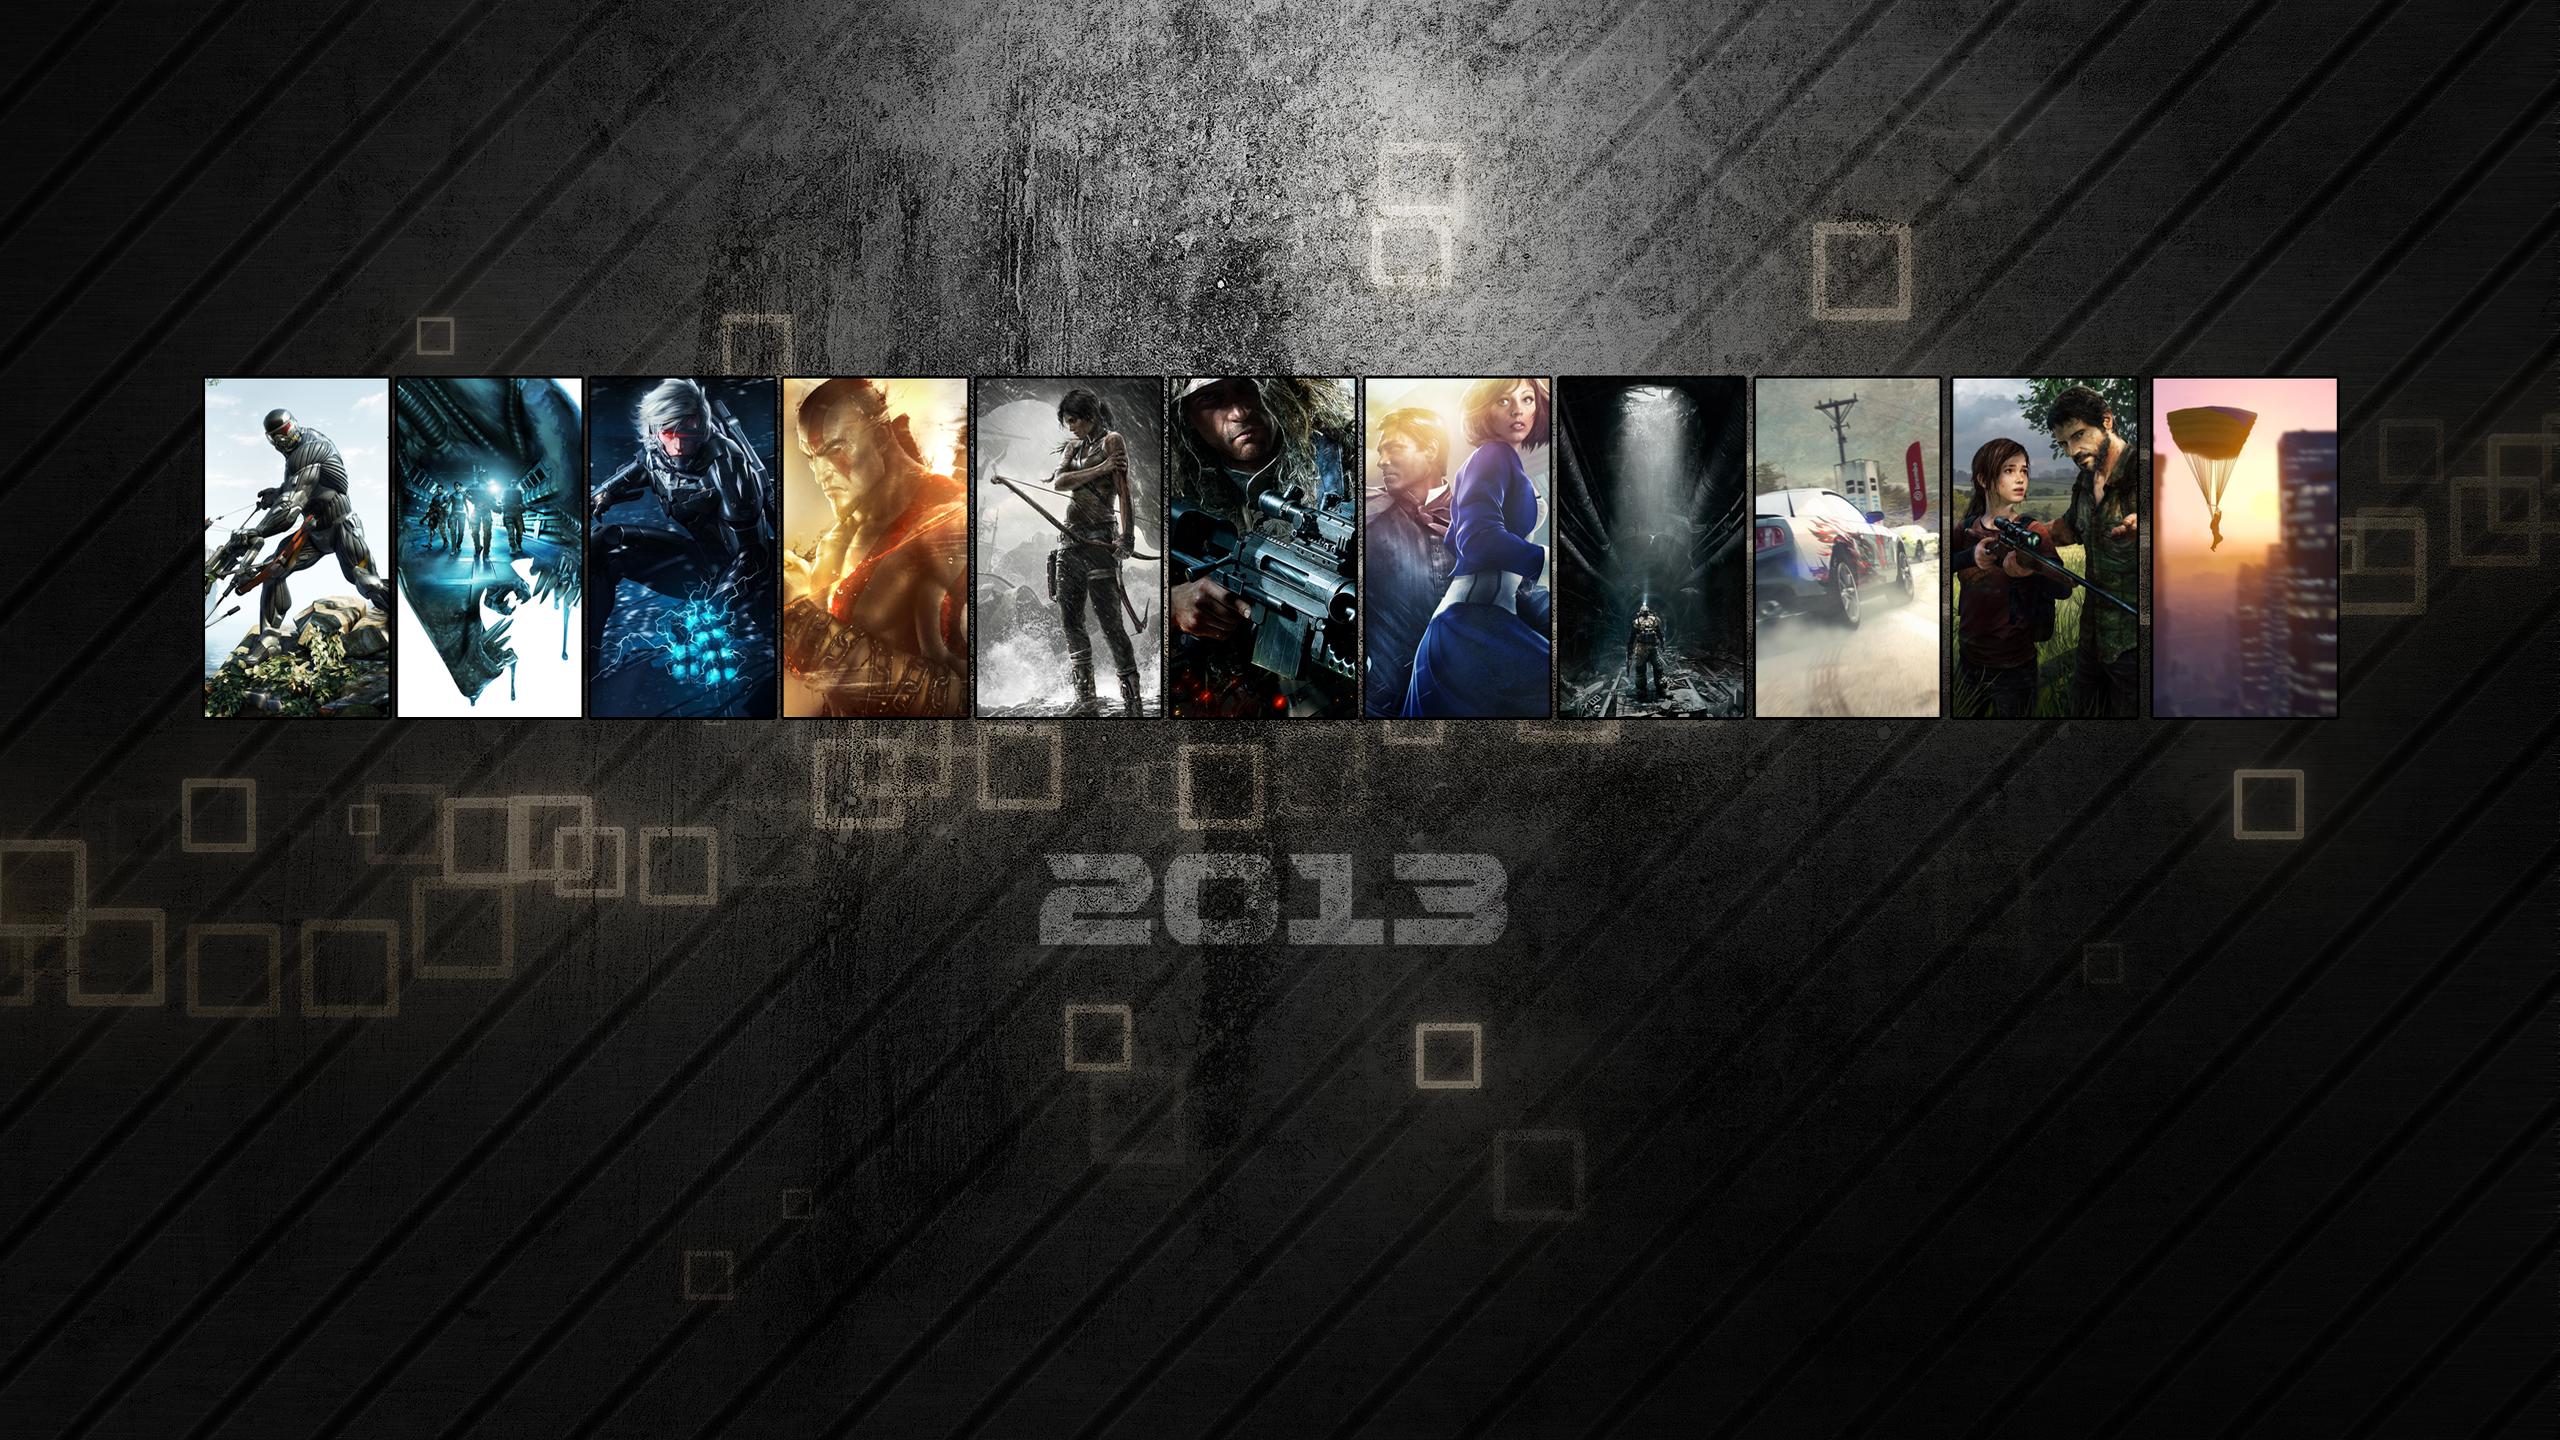 2560x1440 gaming wallpaper danasrhntop 2560x1440